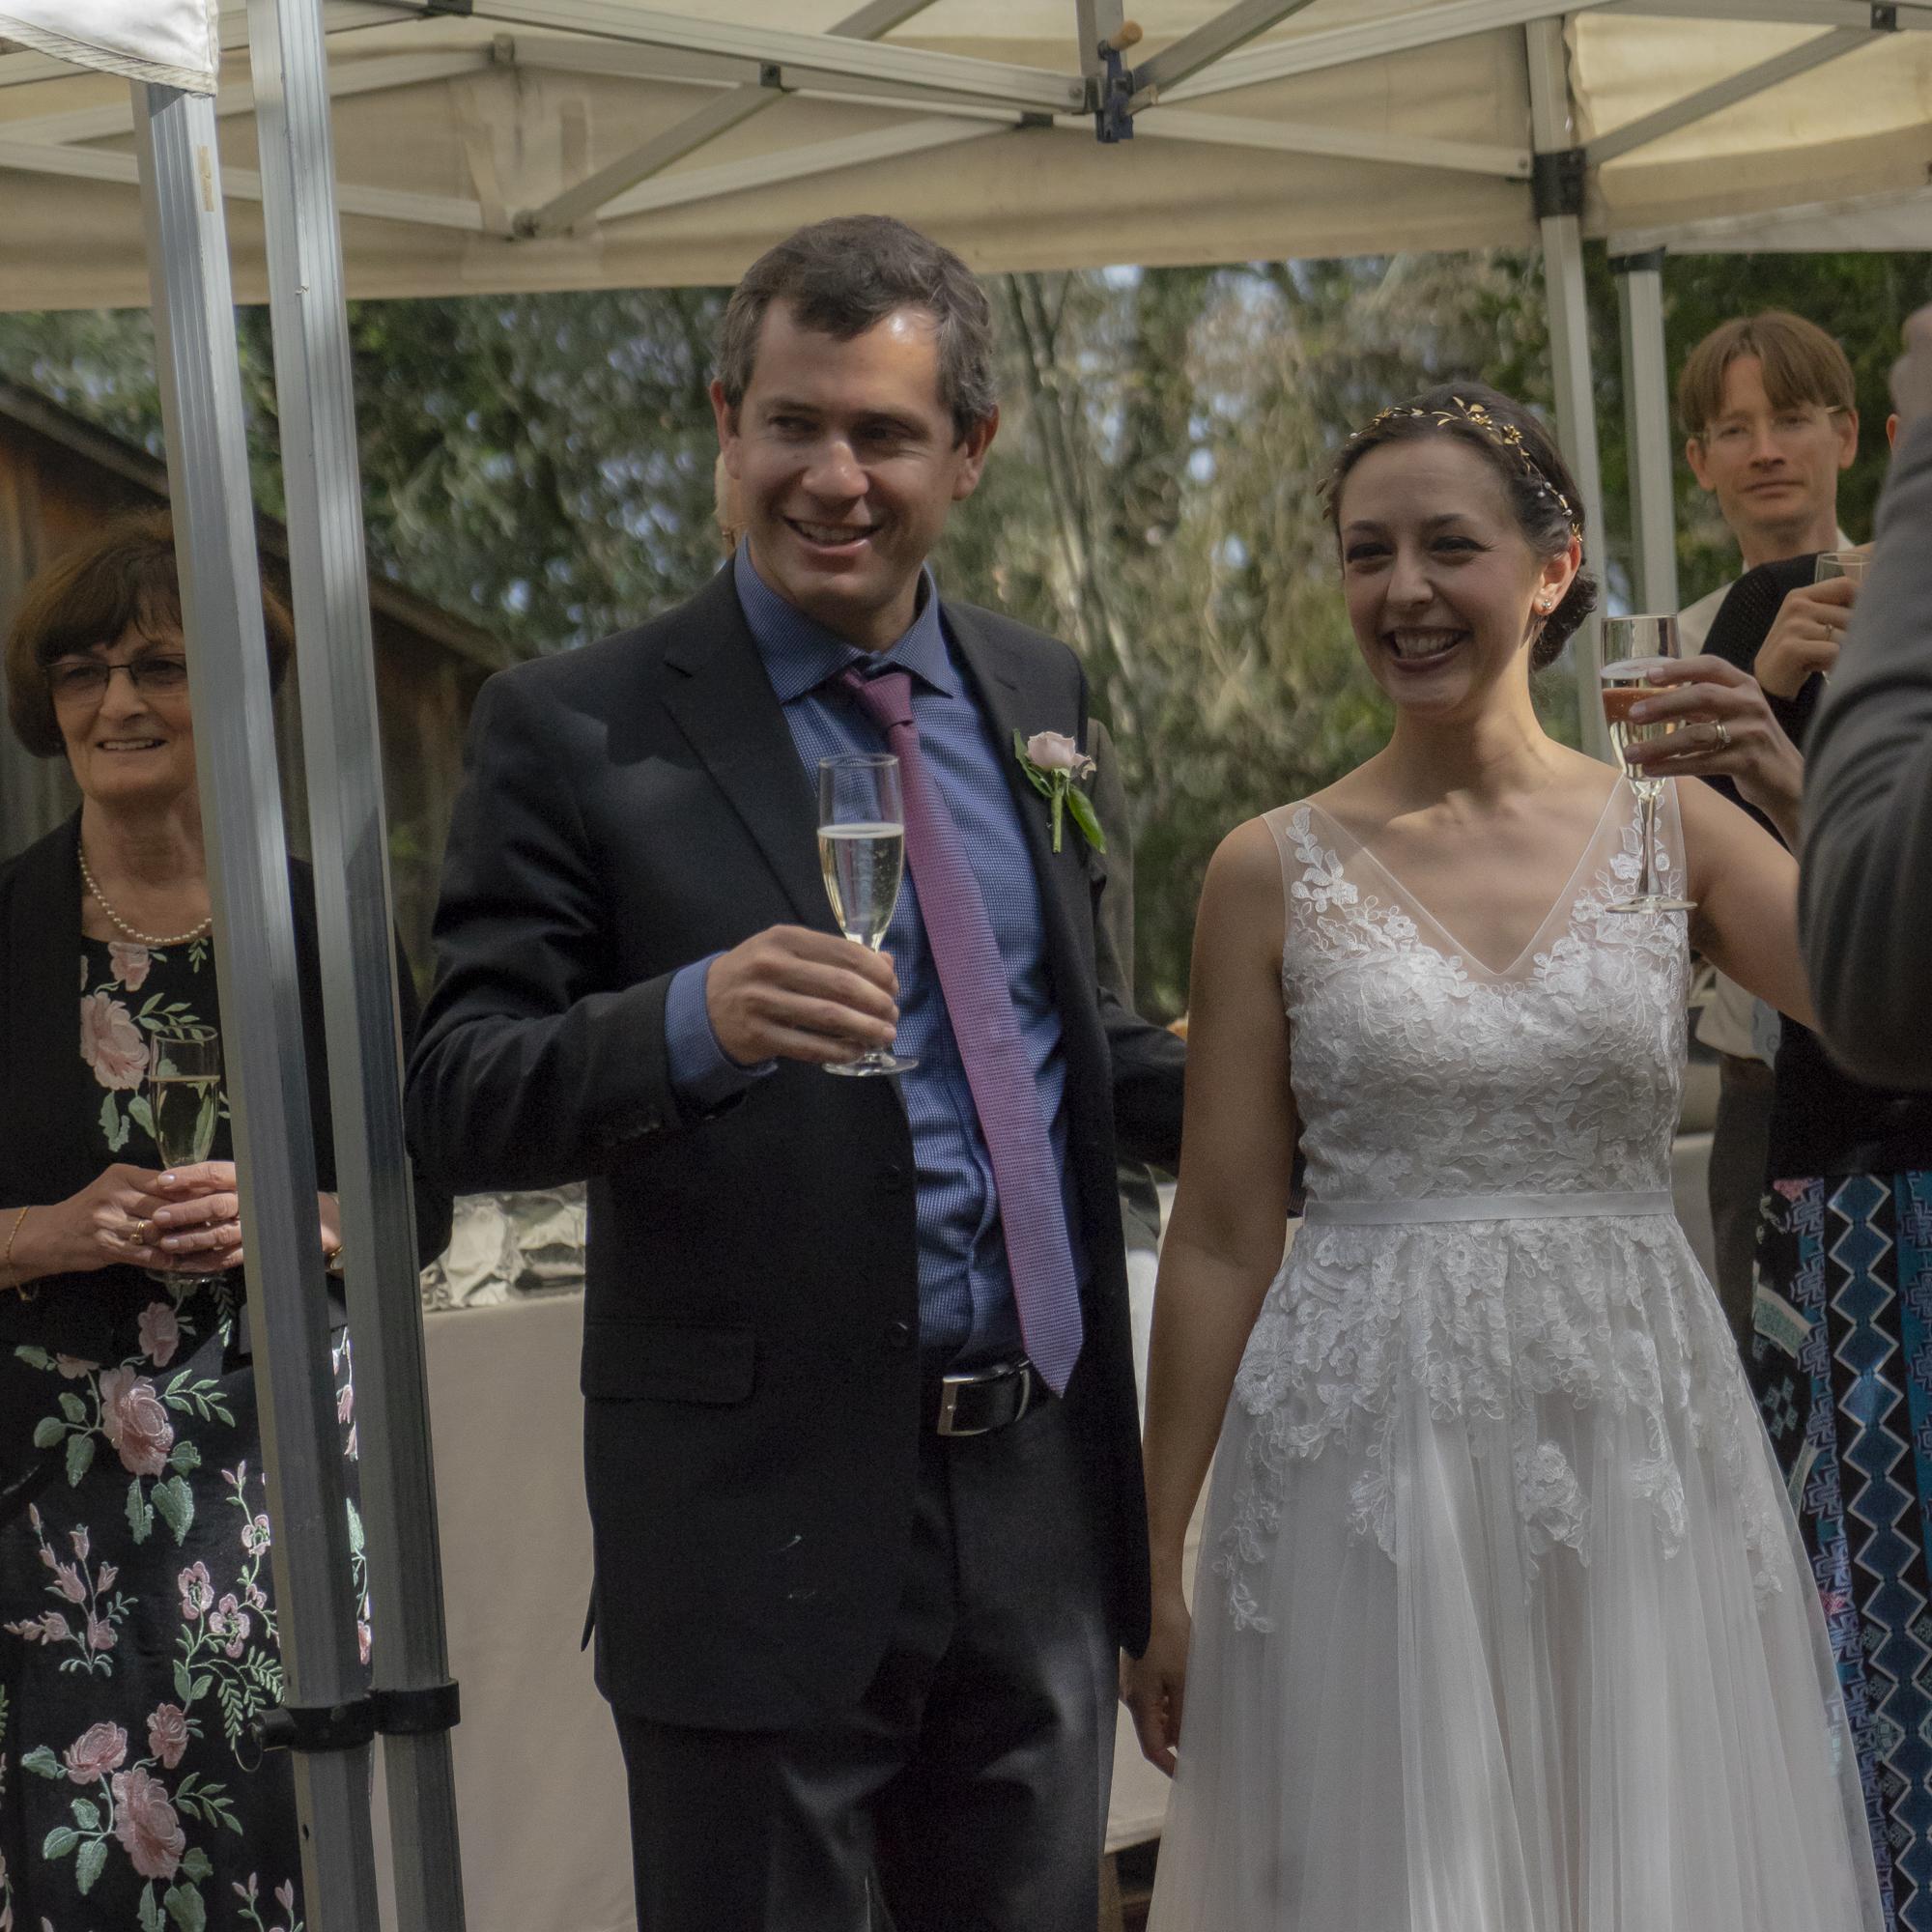 pg_wedding-105.jpg